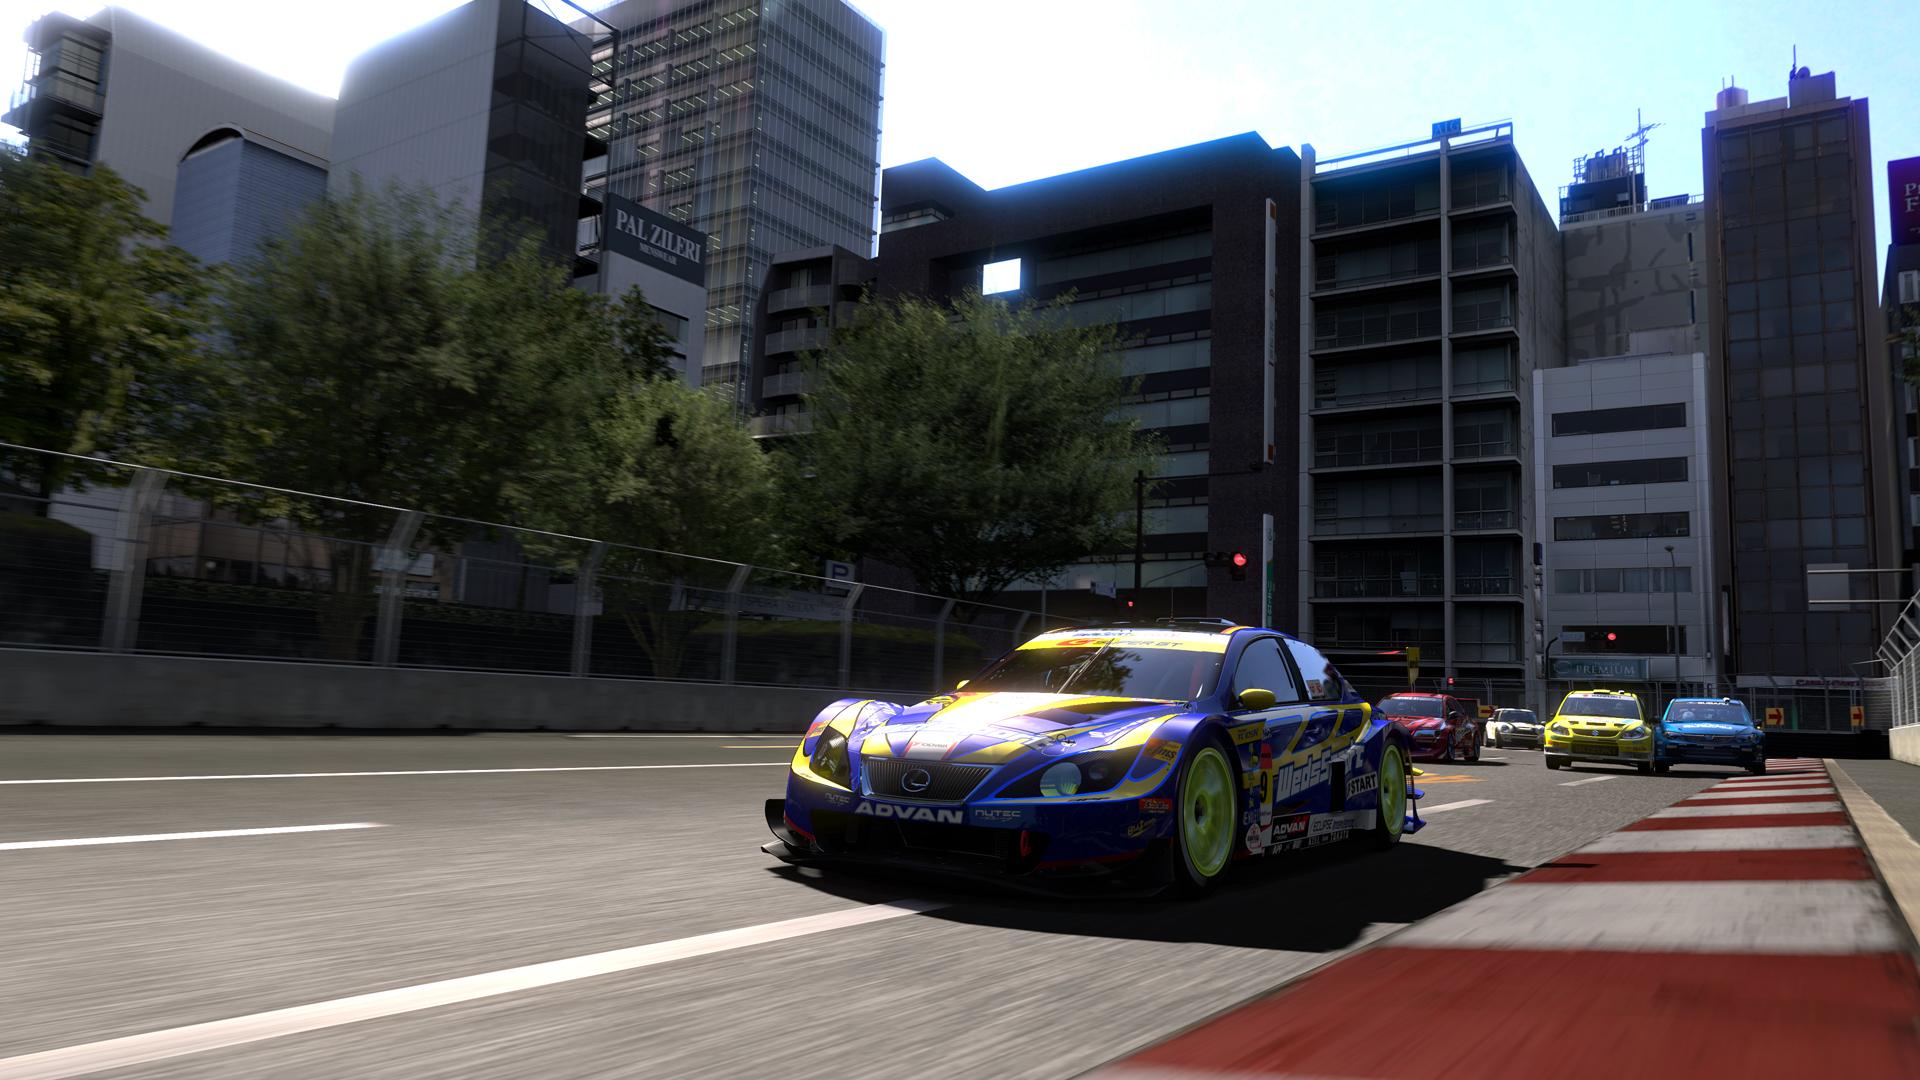 gran turismo 5 new race car screenshots sim racing news. Black Bedroom Furniture Sets. Home Design Ideas